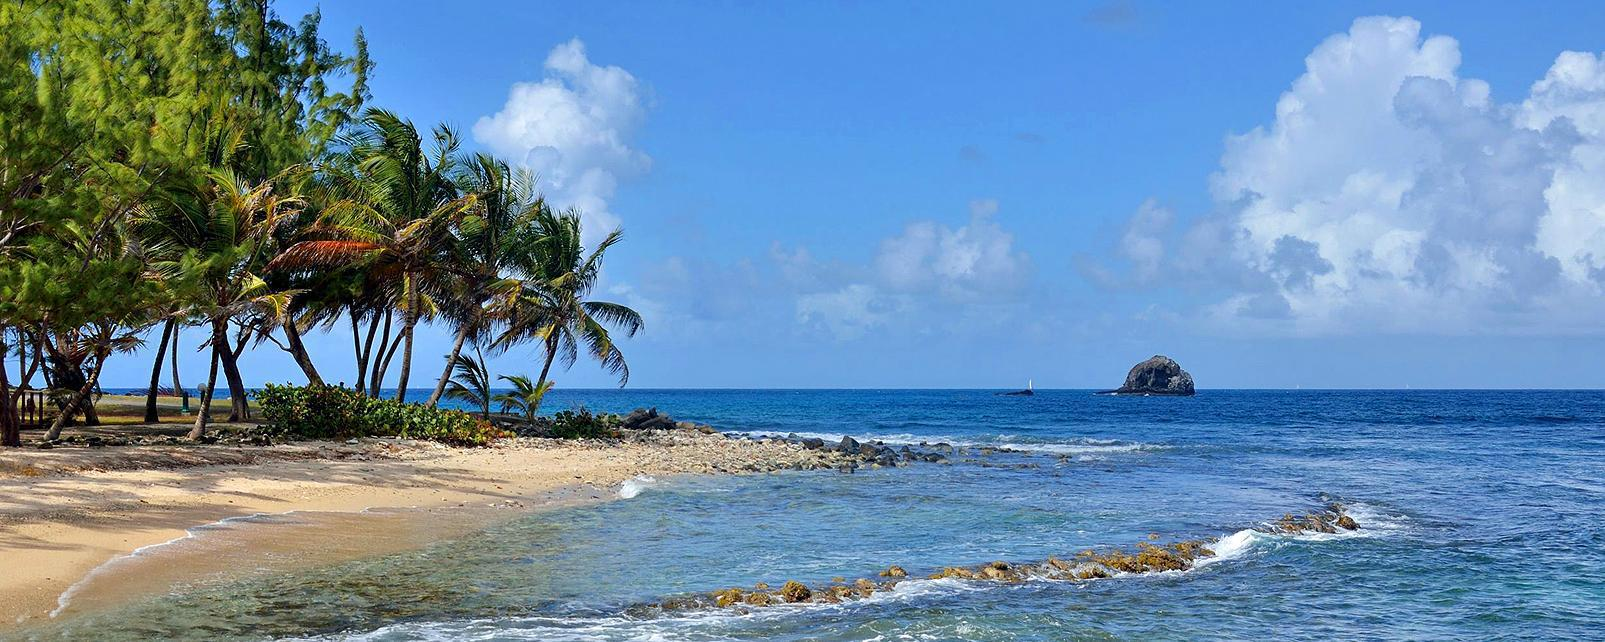 Caraïbes; Caraibes; Sainte-Lucie; Gros Islet;